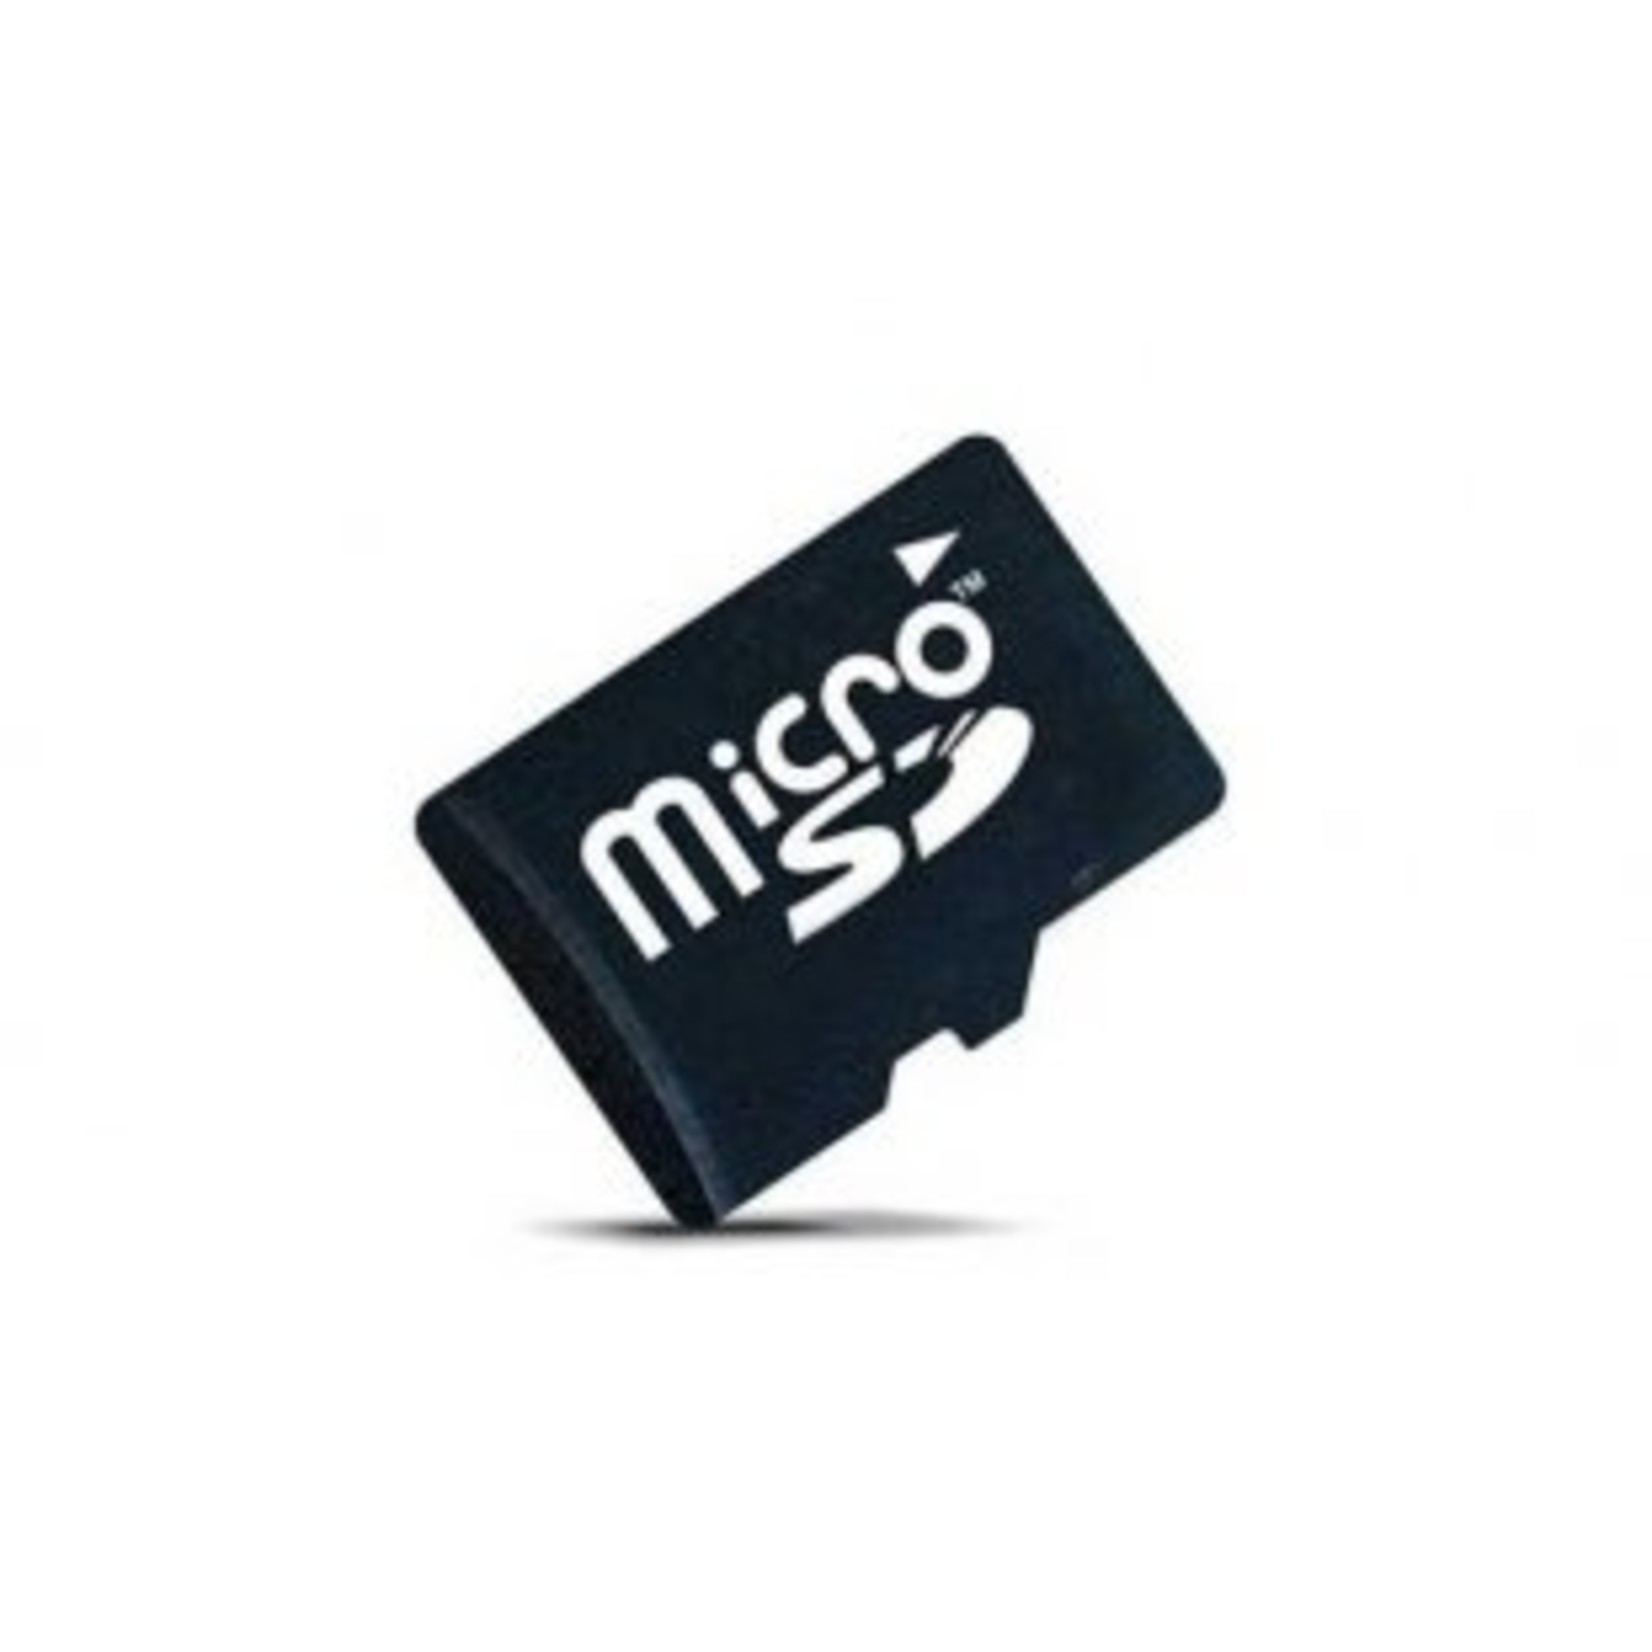 128GB Micro SD Card used